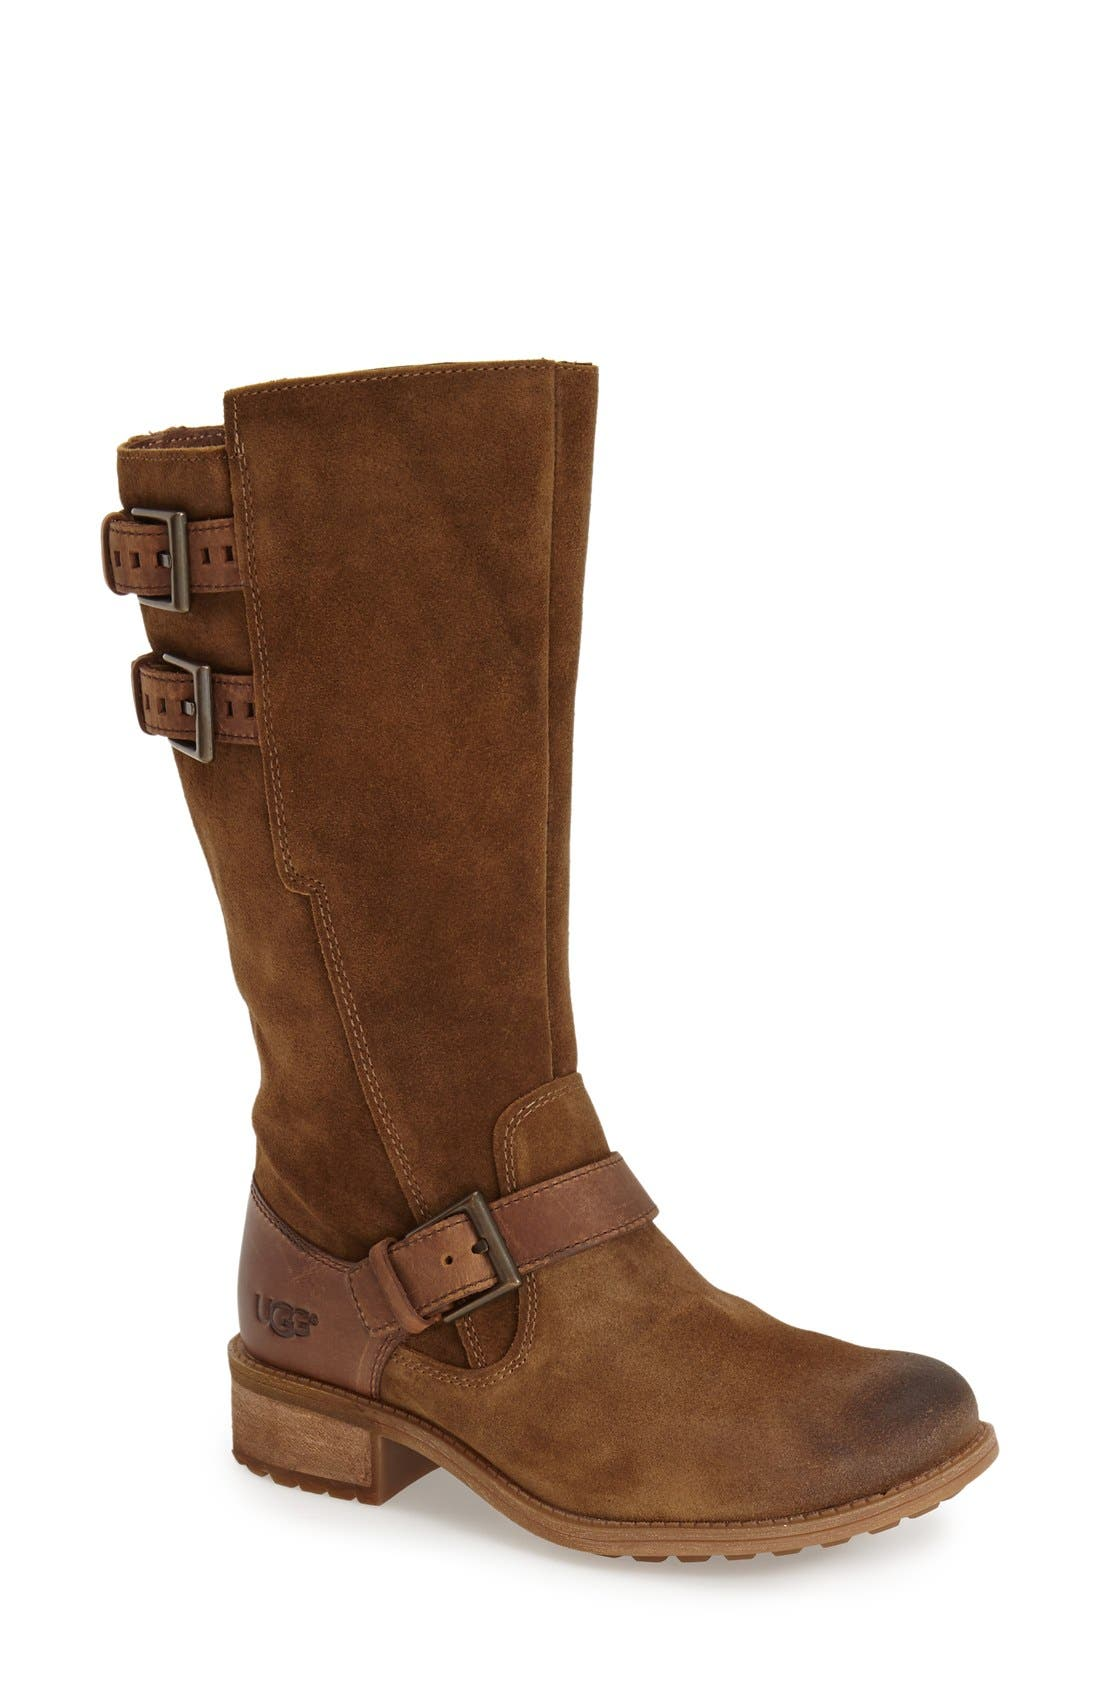 Main Image - UGG Australia® 'Everglayde' Tall Boot (Women)